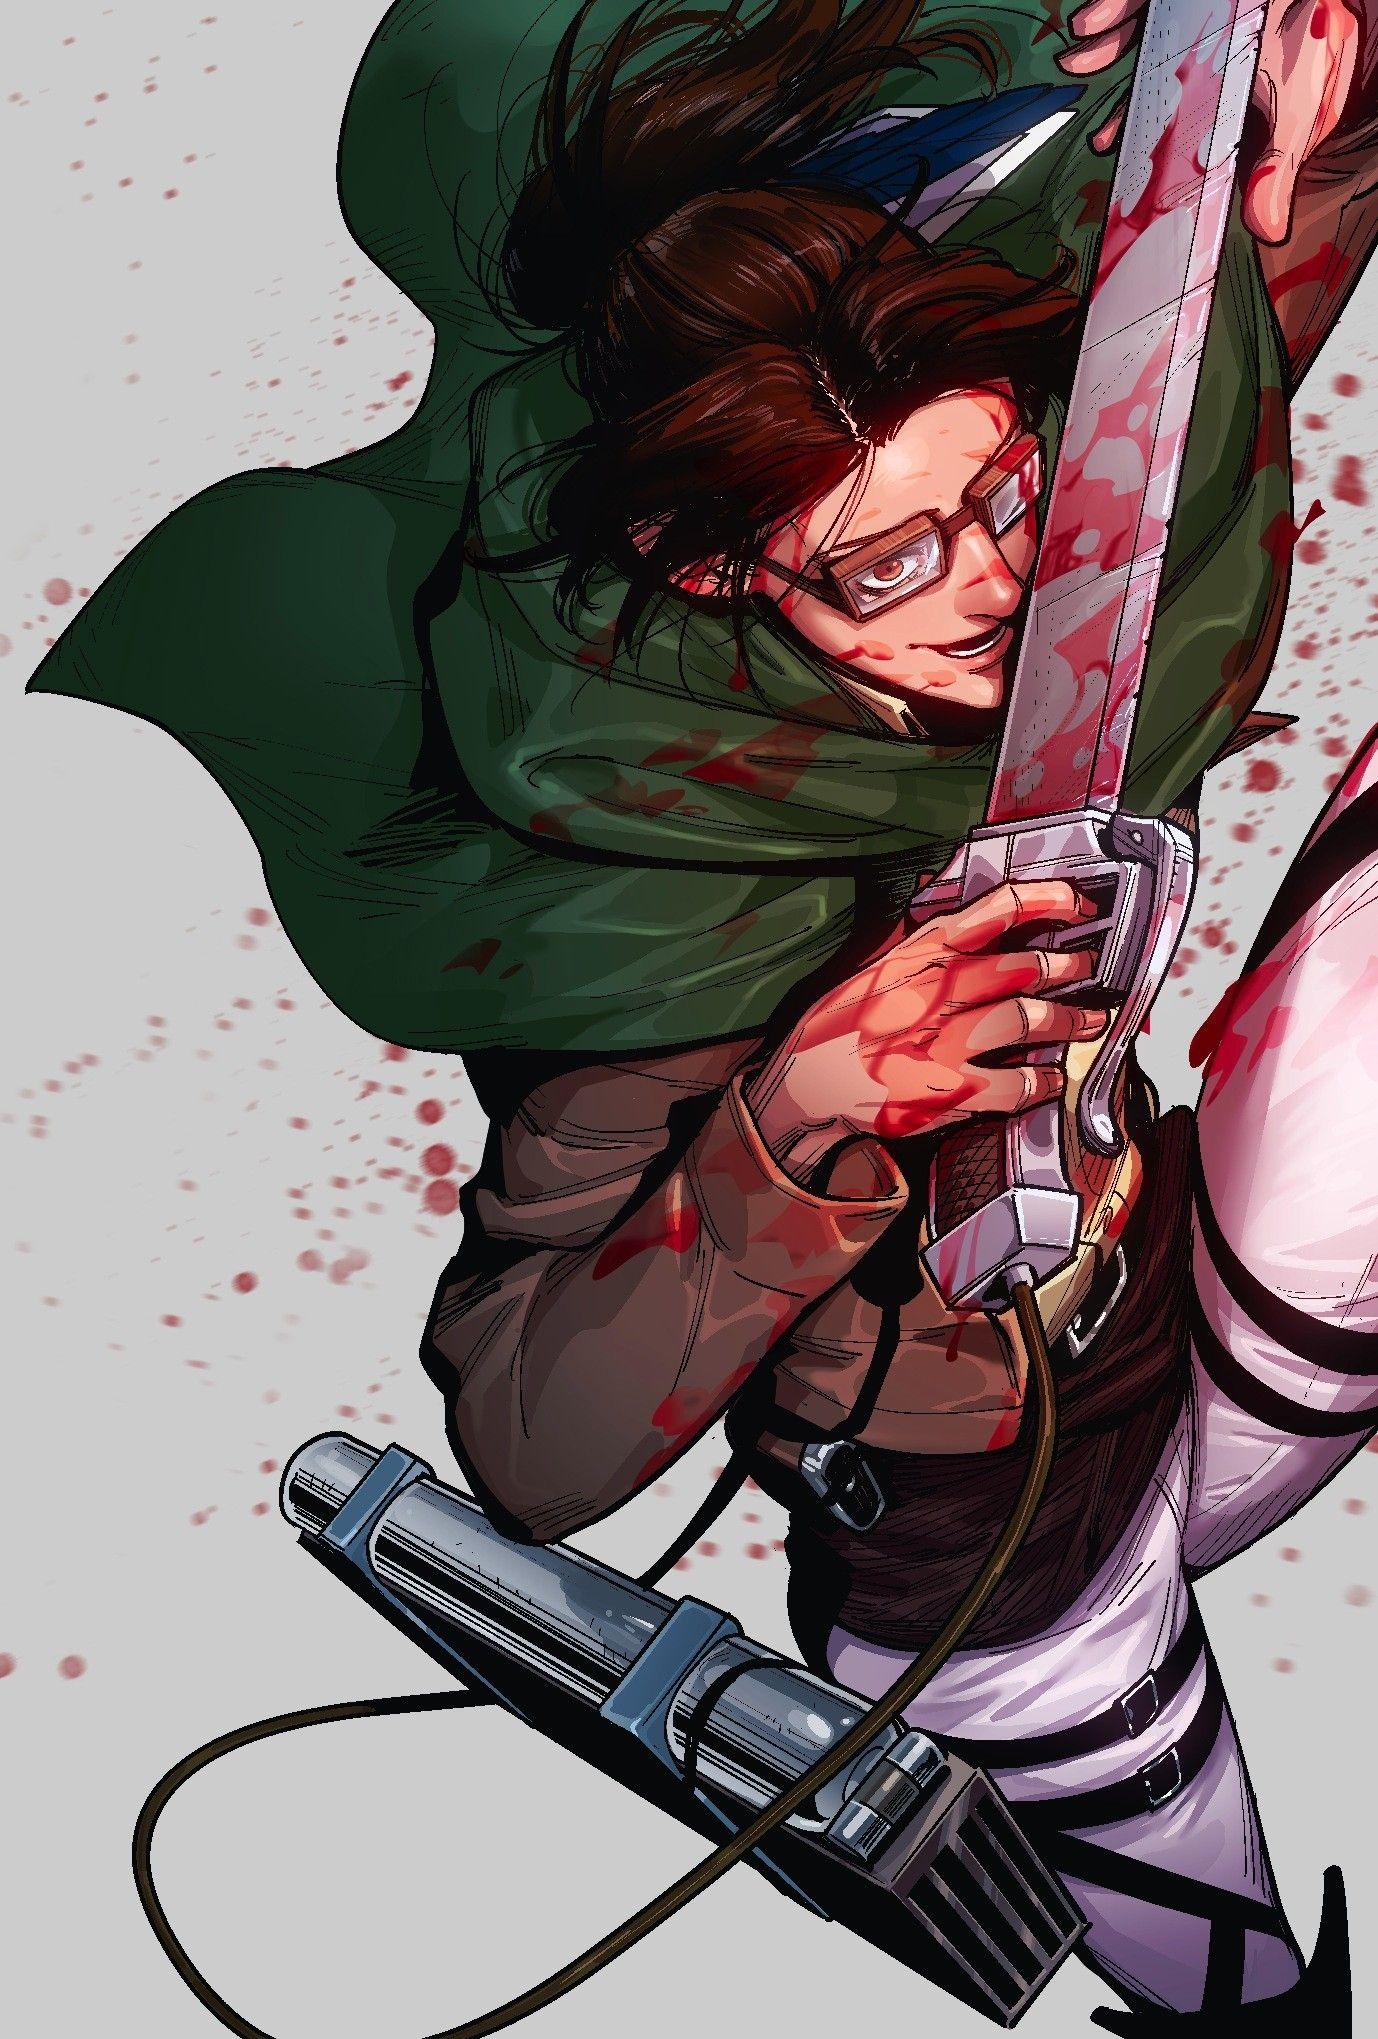 Hange Zoe Attack On Titan Anime Attack On Titan Fanart Attack On Titan Art